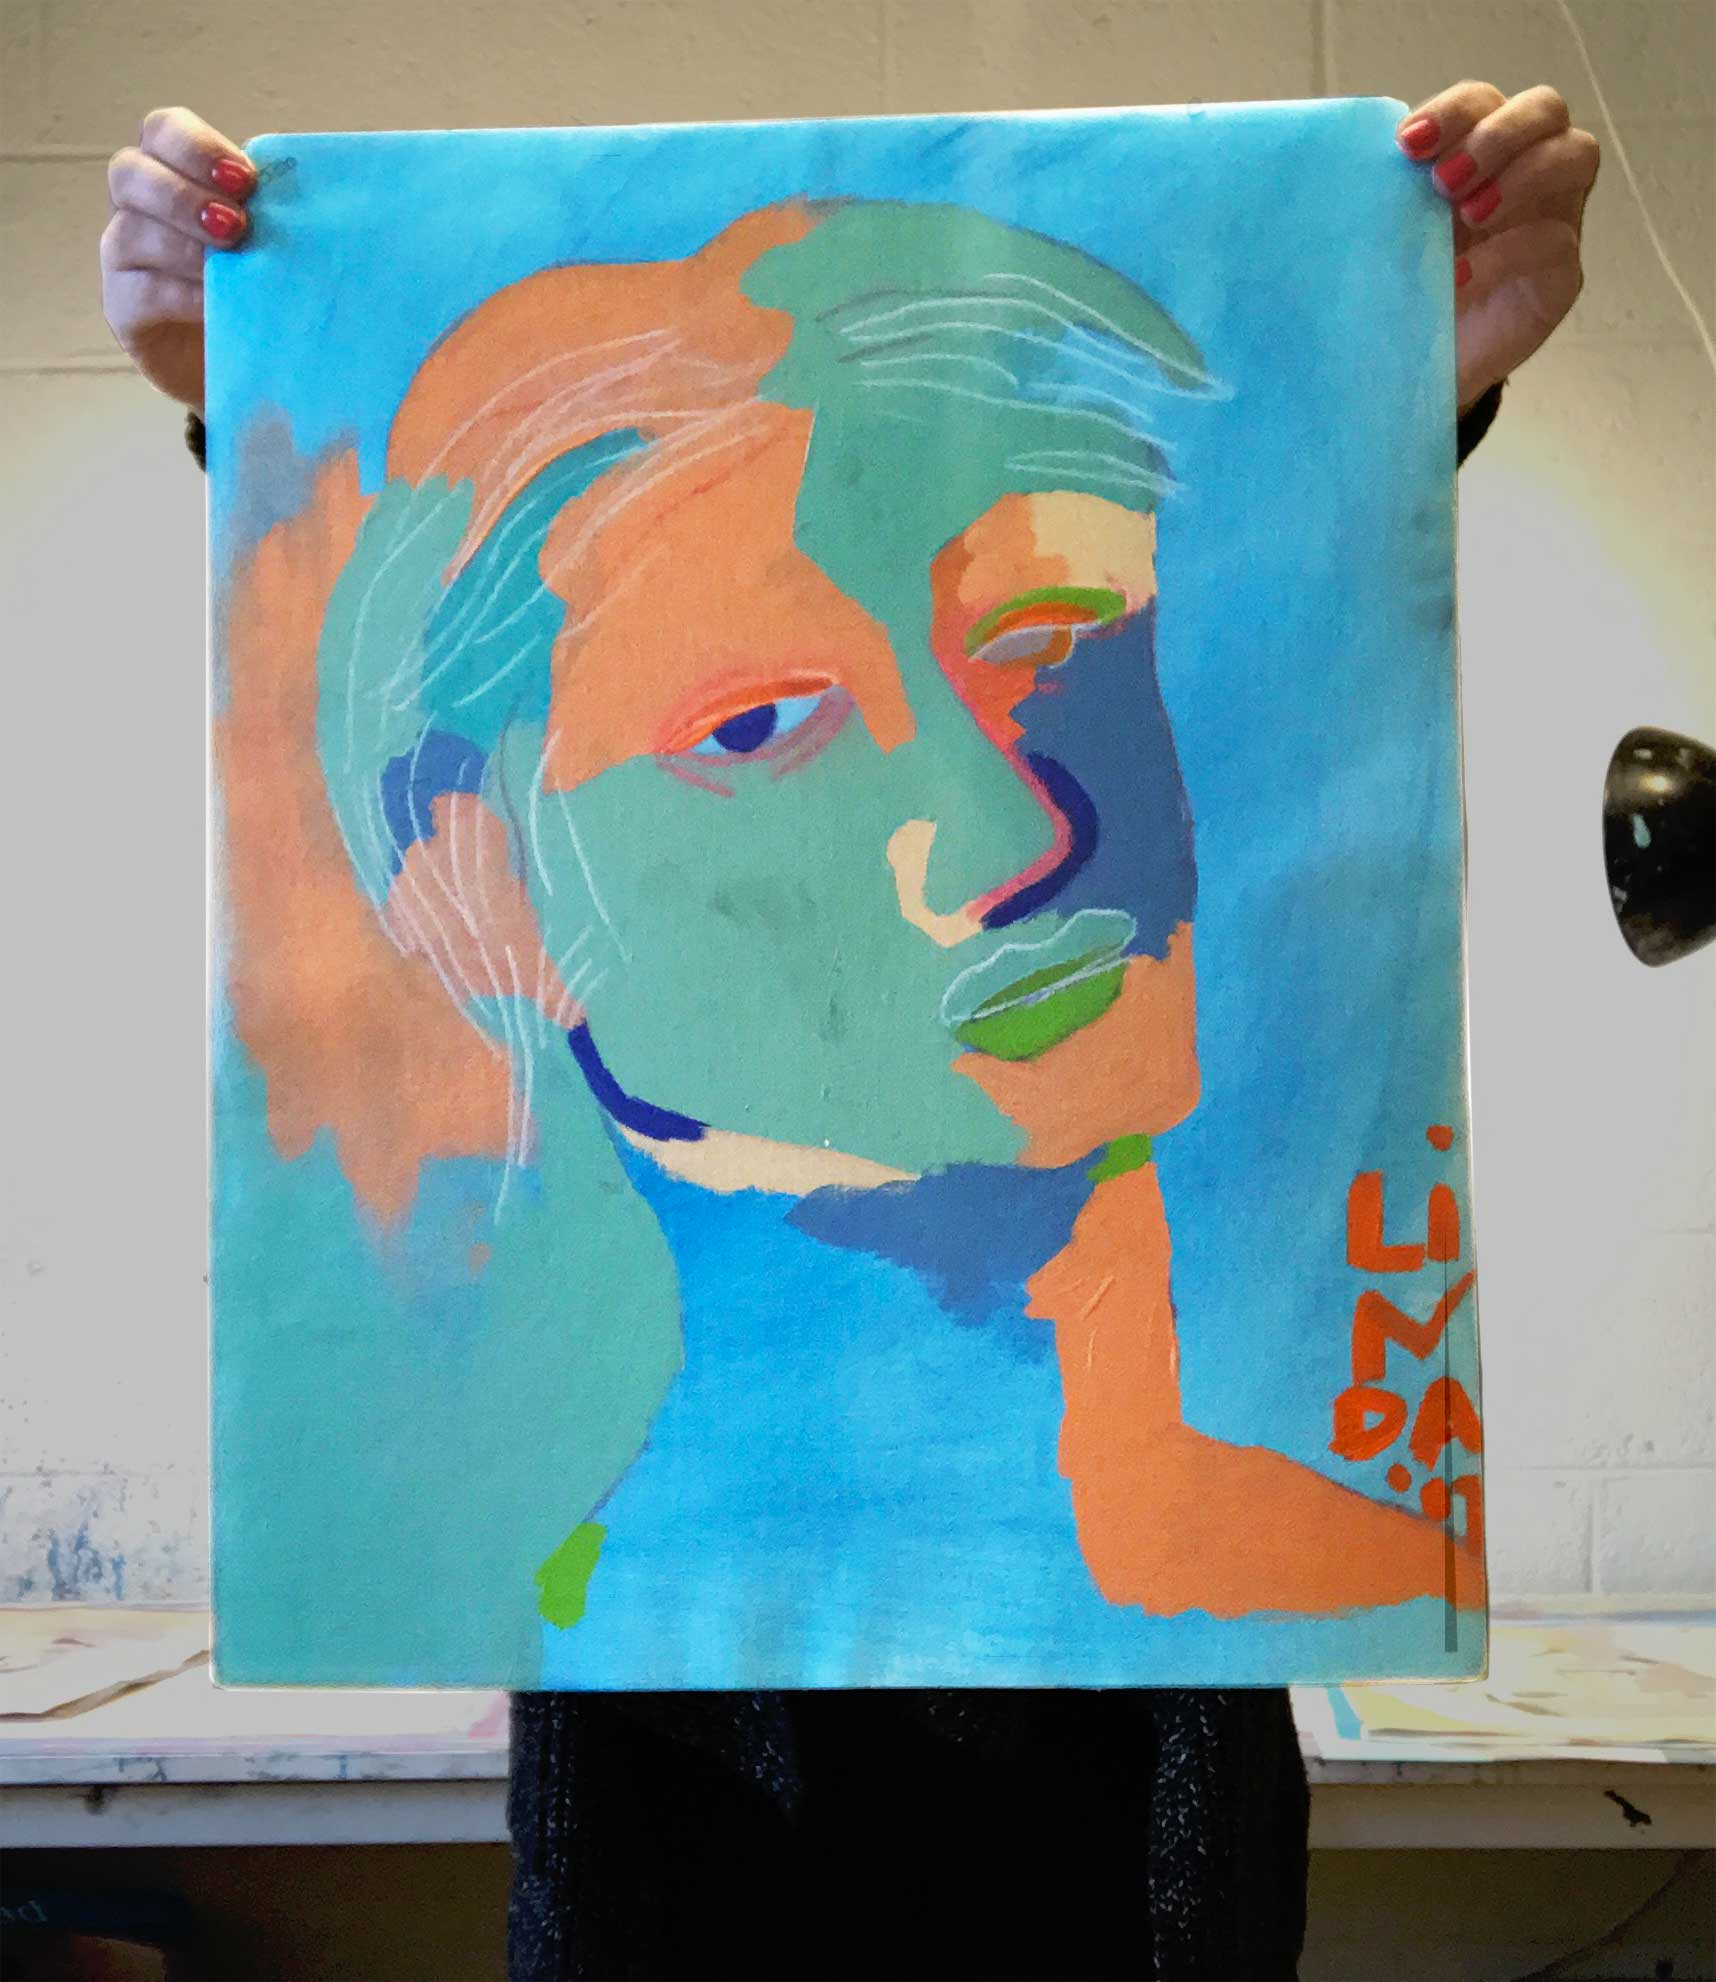 Linda Ward is a Detroit contemporary expressionist artist. Original artwork for sale.